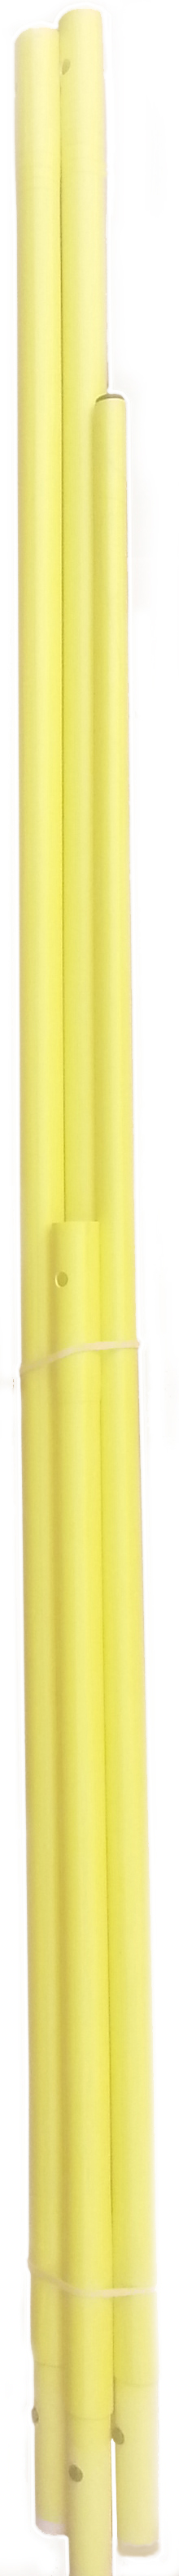 kit perche jaune 6m